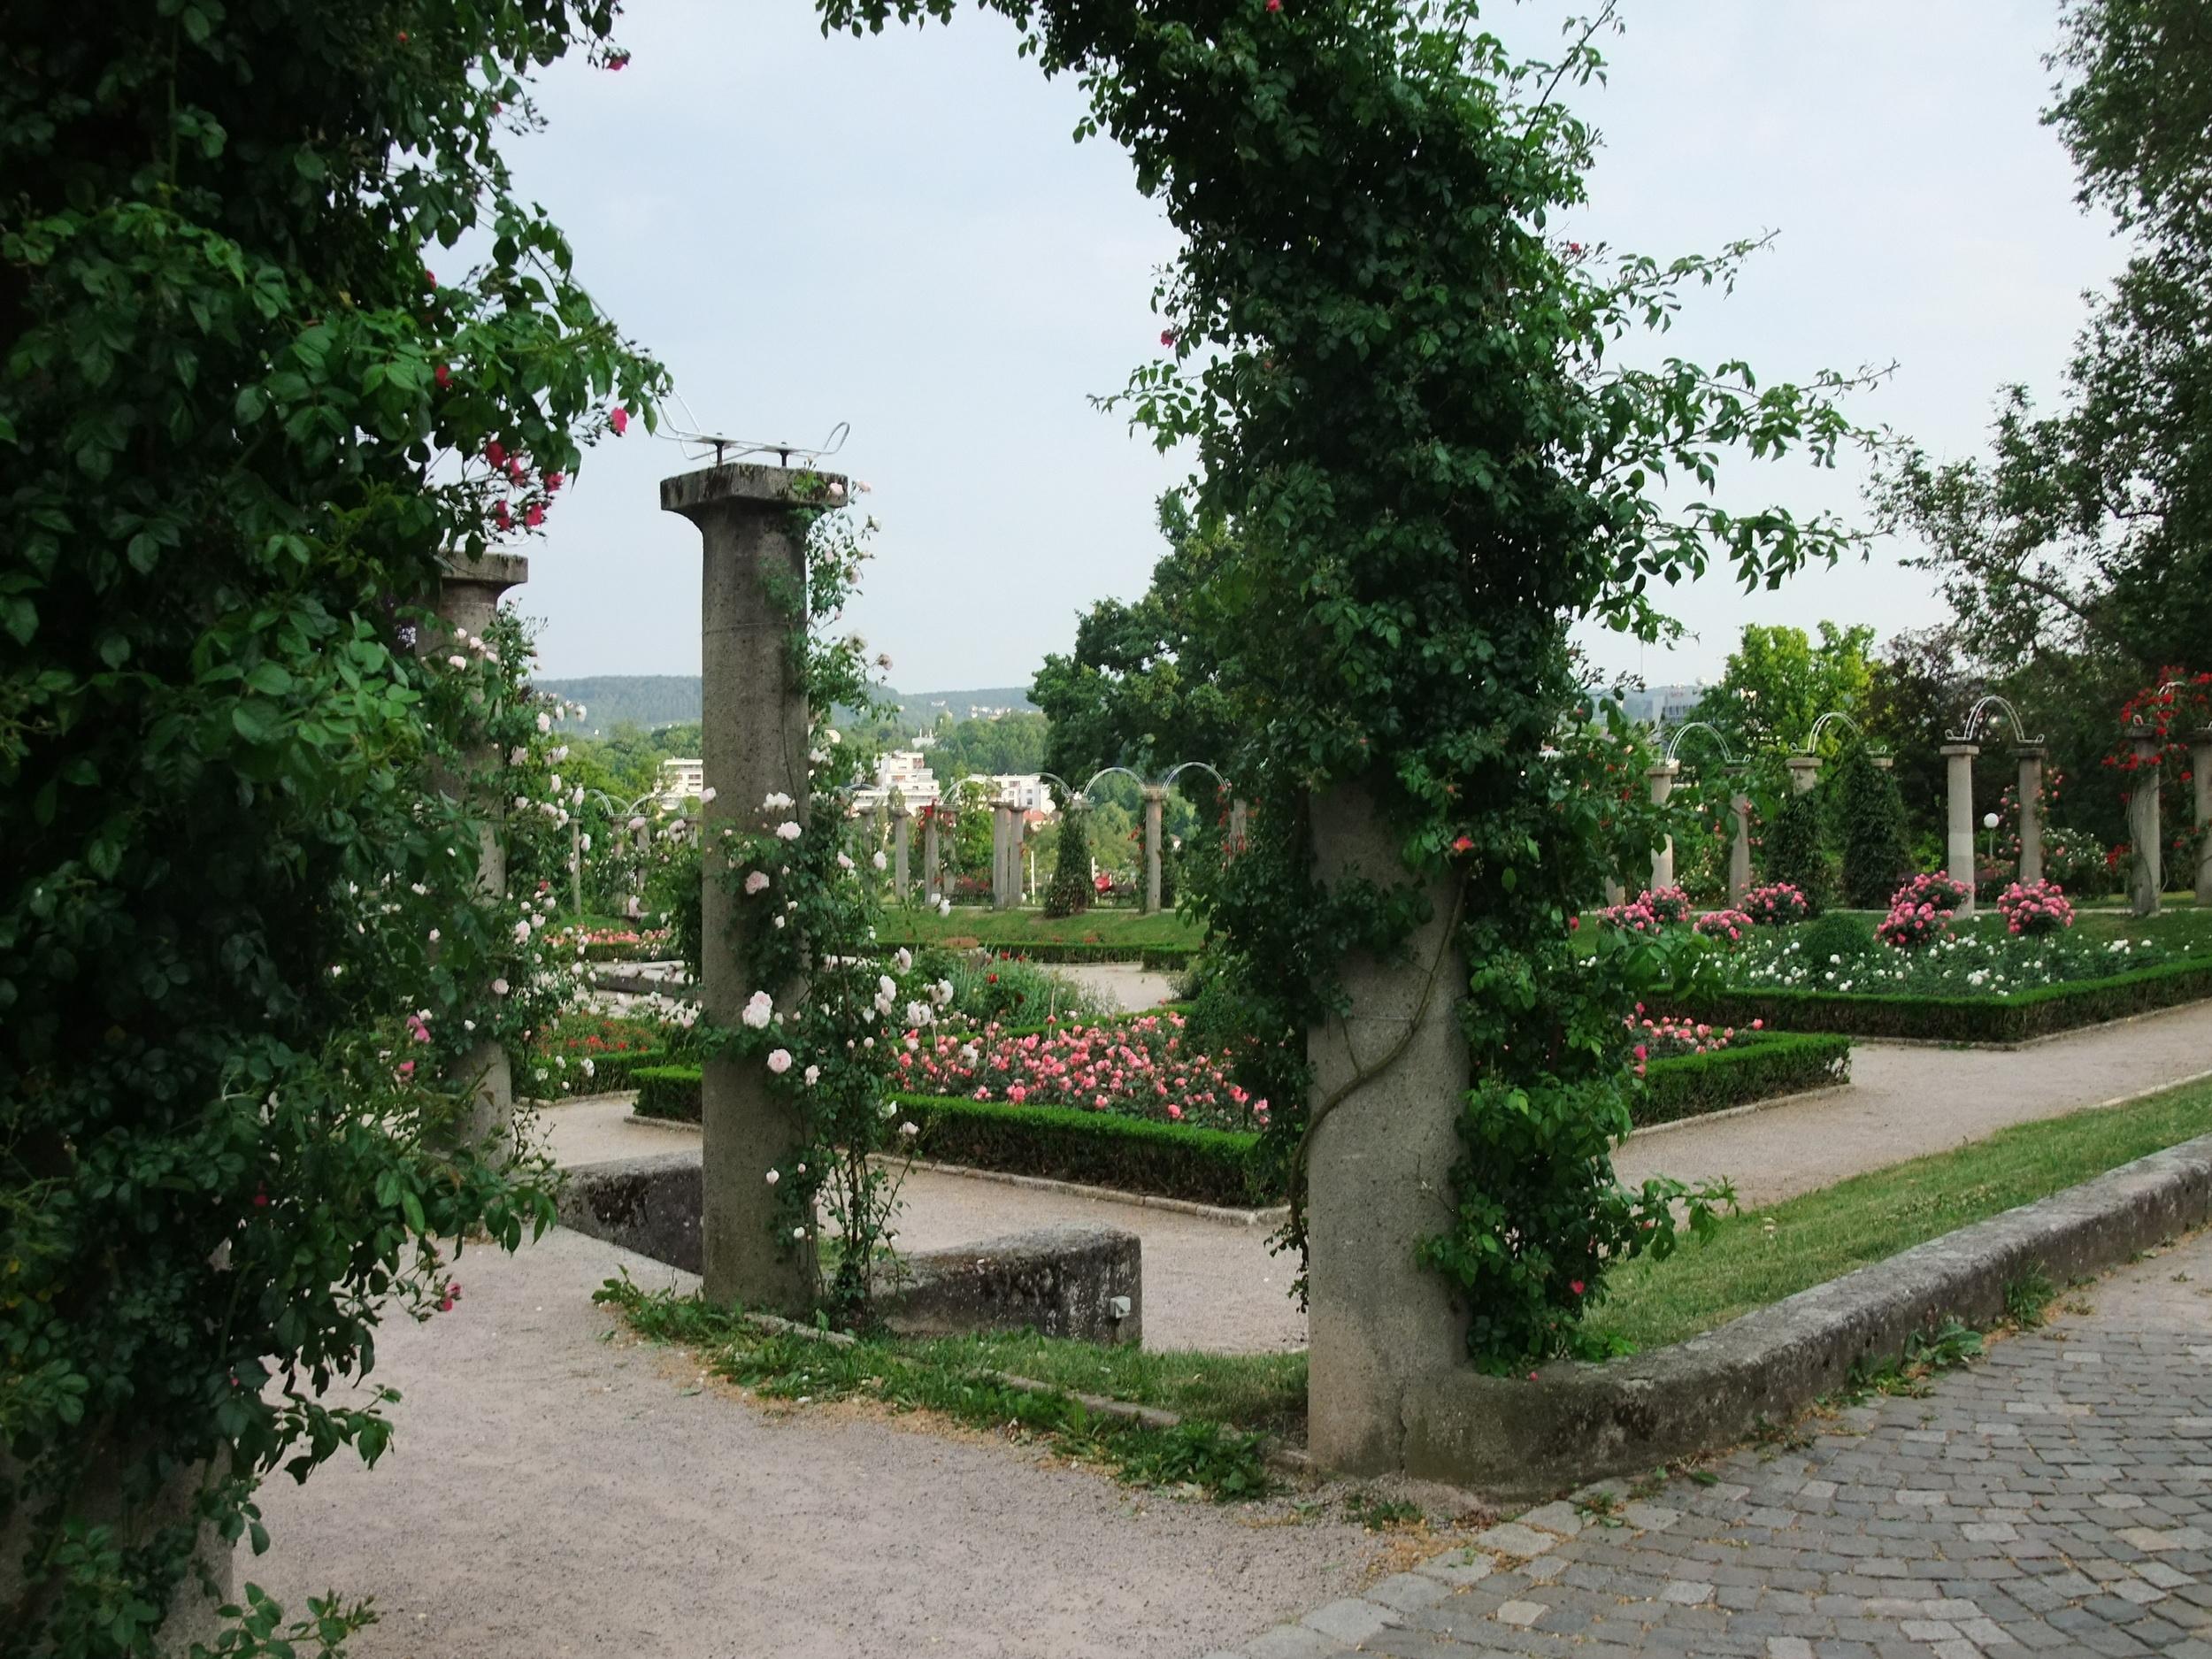 The rose garden at Rosenstein Palace